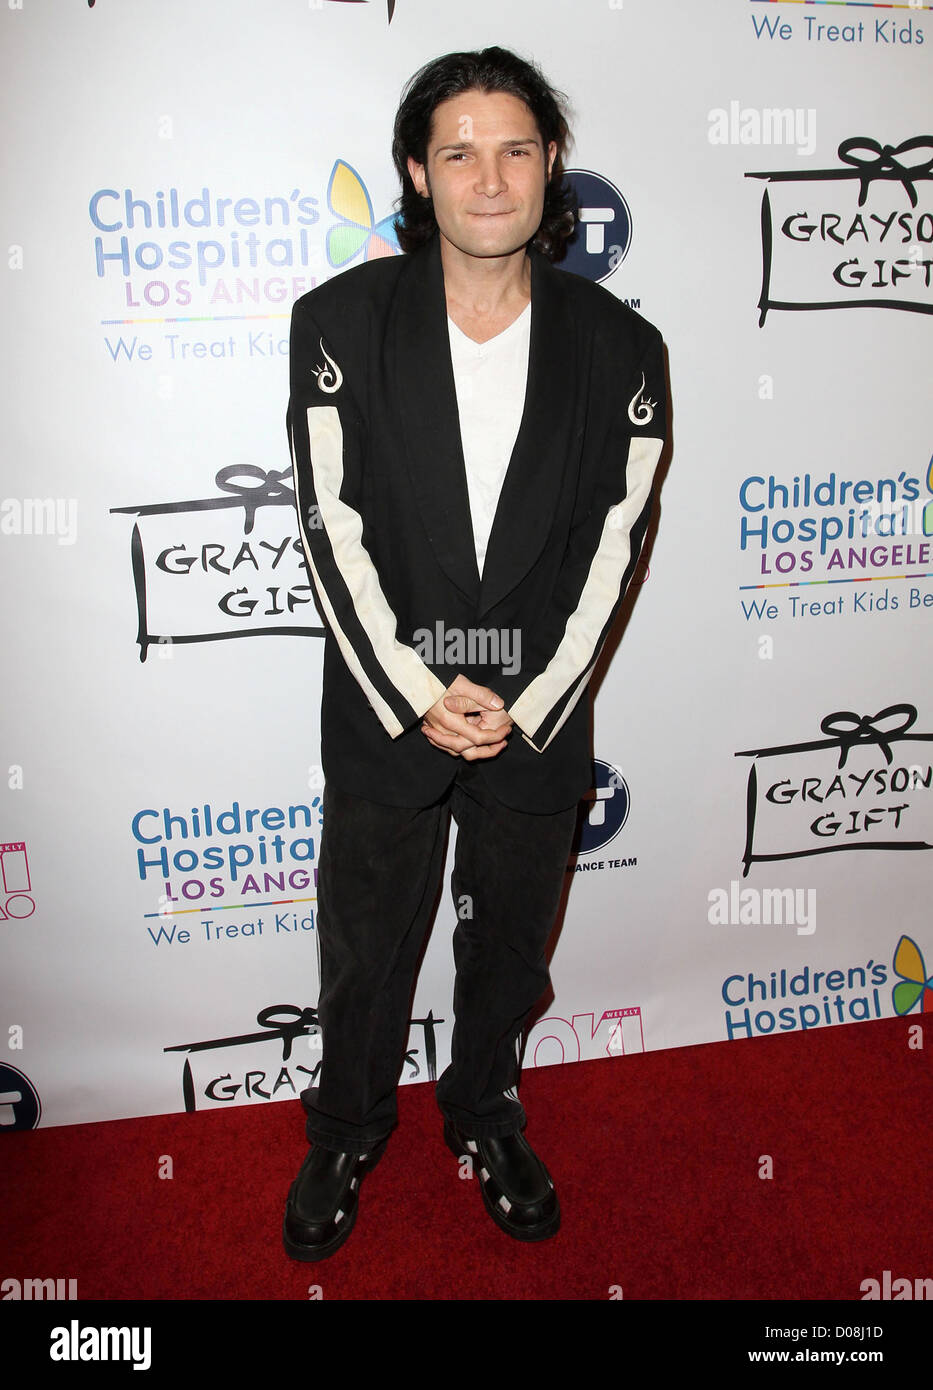 Corey Feldman CHLA'S 1st Annual Grayson's Gift Foundation held at